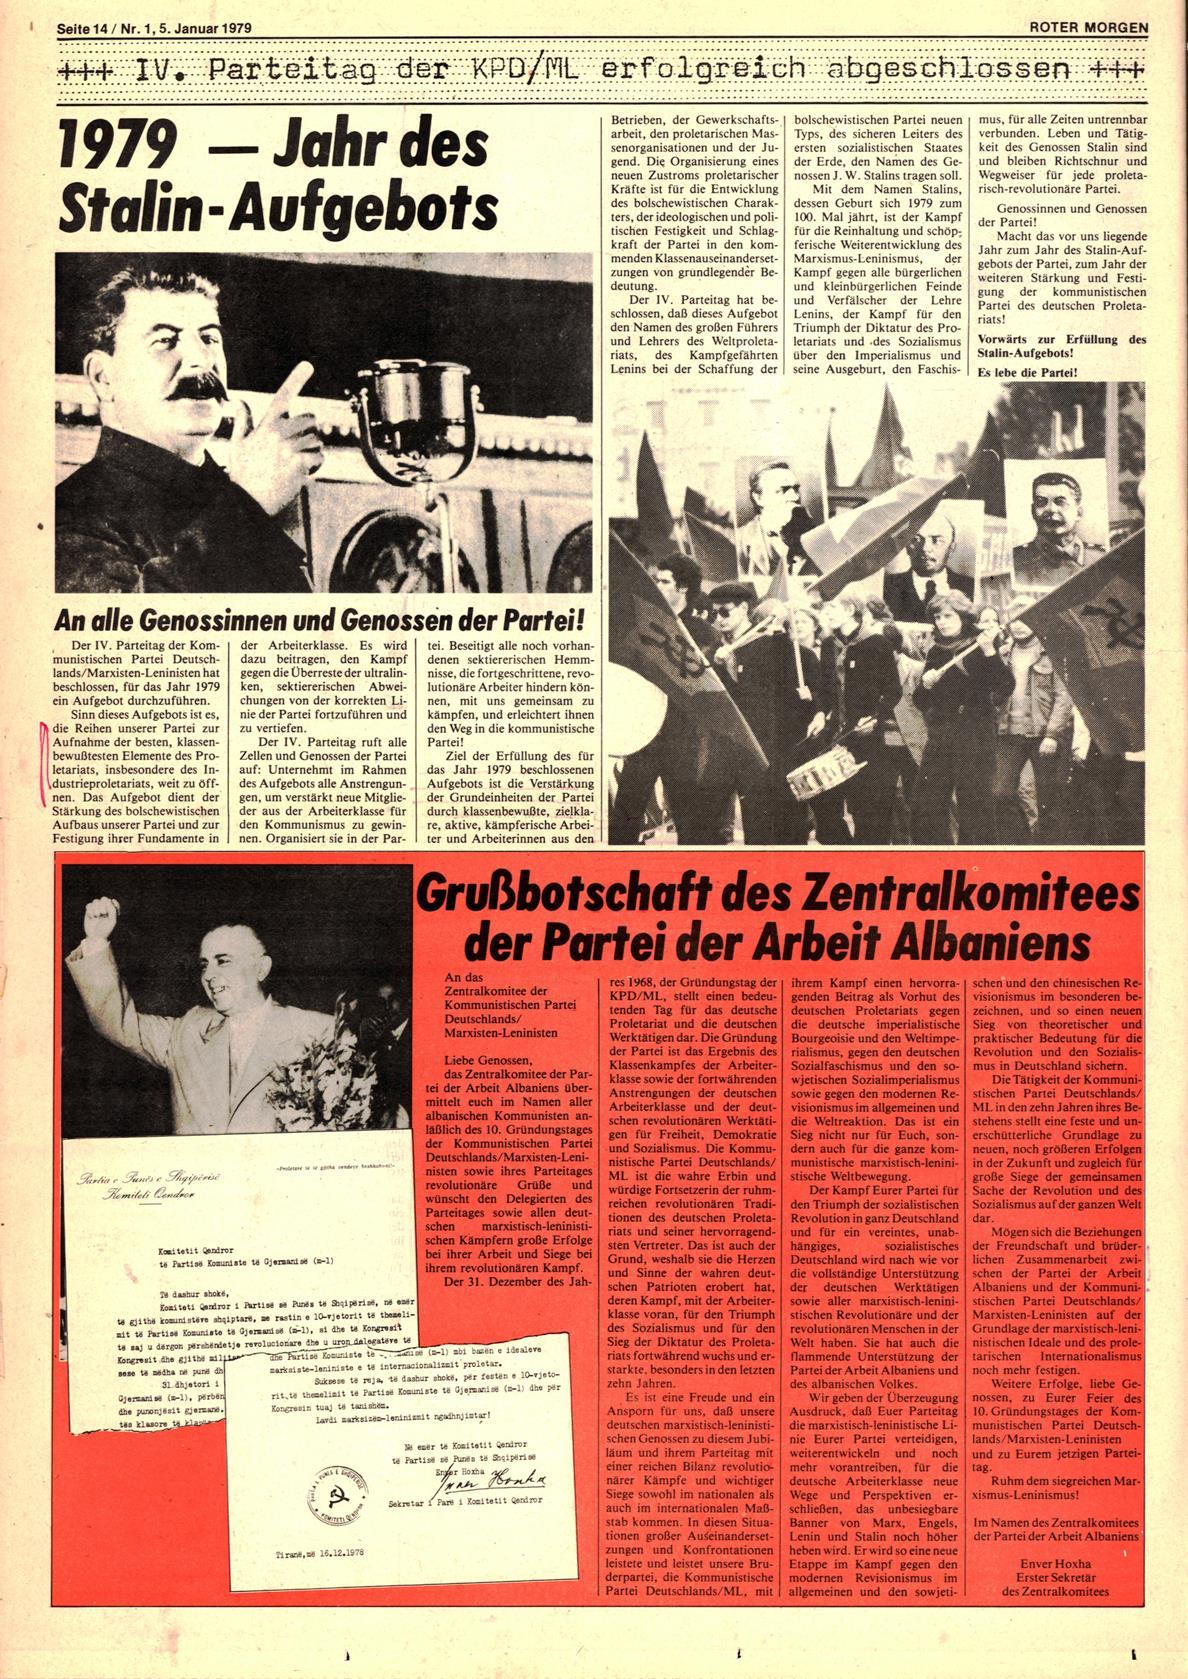 Roter Morgen, 13. Jg., 5. Januar 1979, Nr. 1, Seite 14